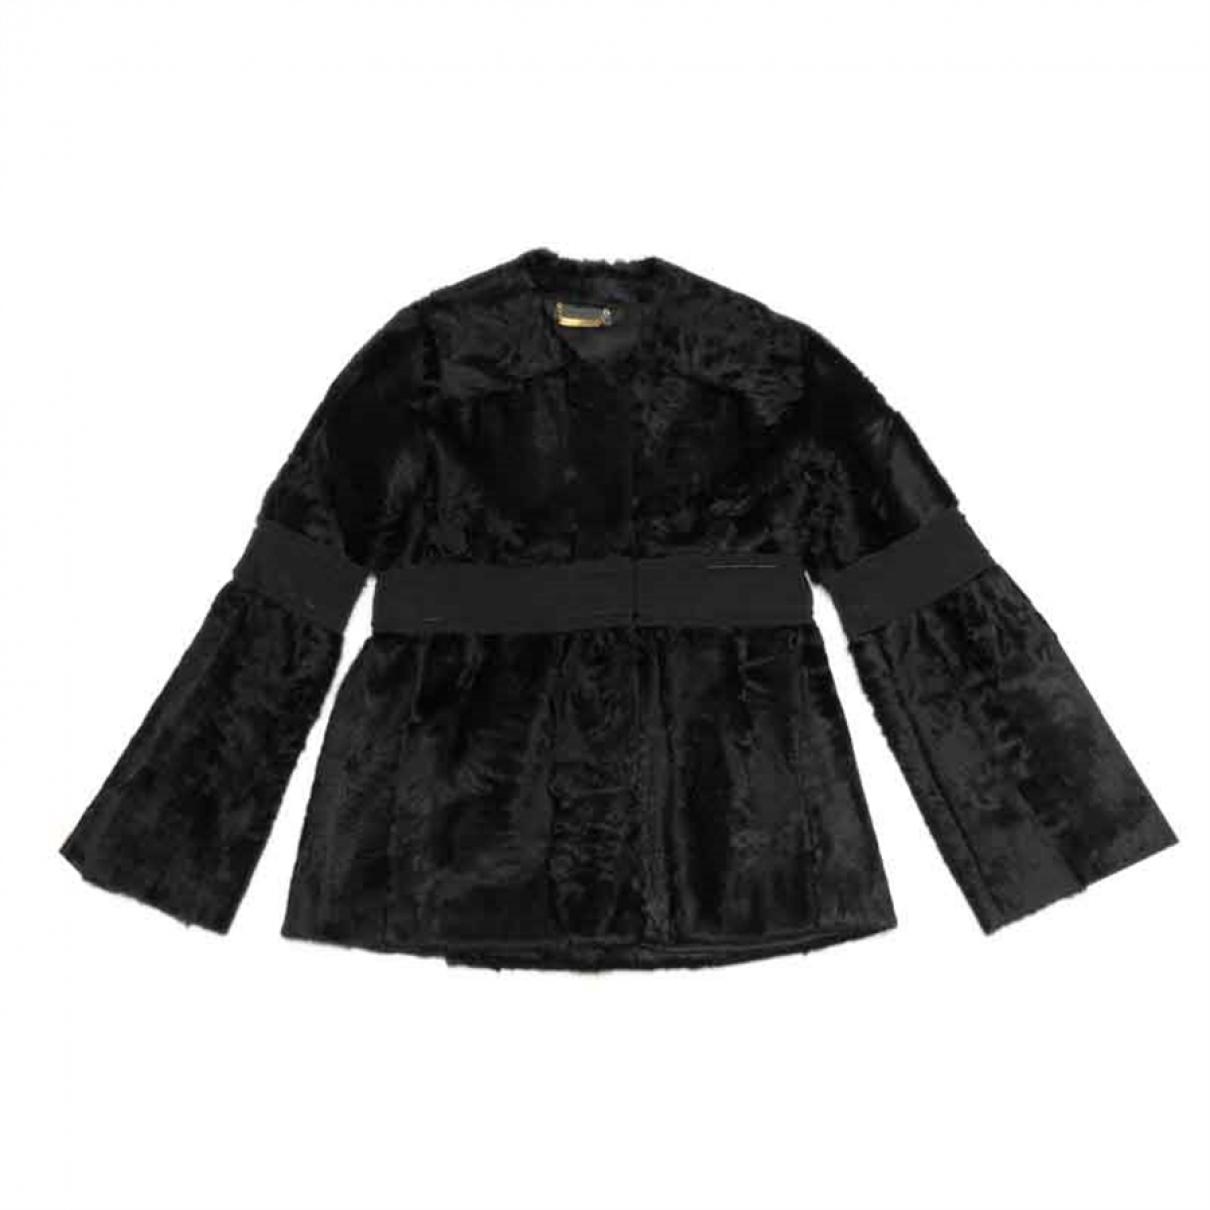 Alberta Ferretti - Veste   pour femme en fourrure - noir